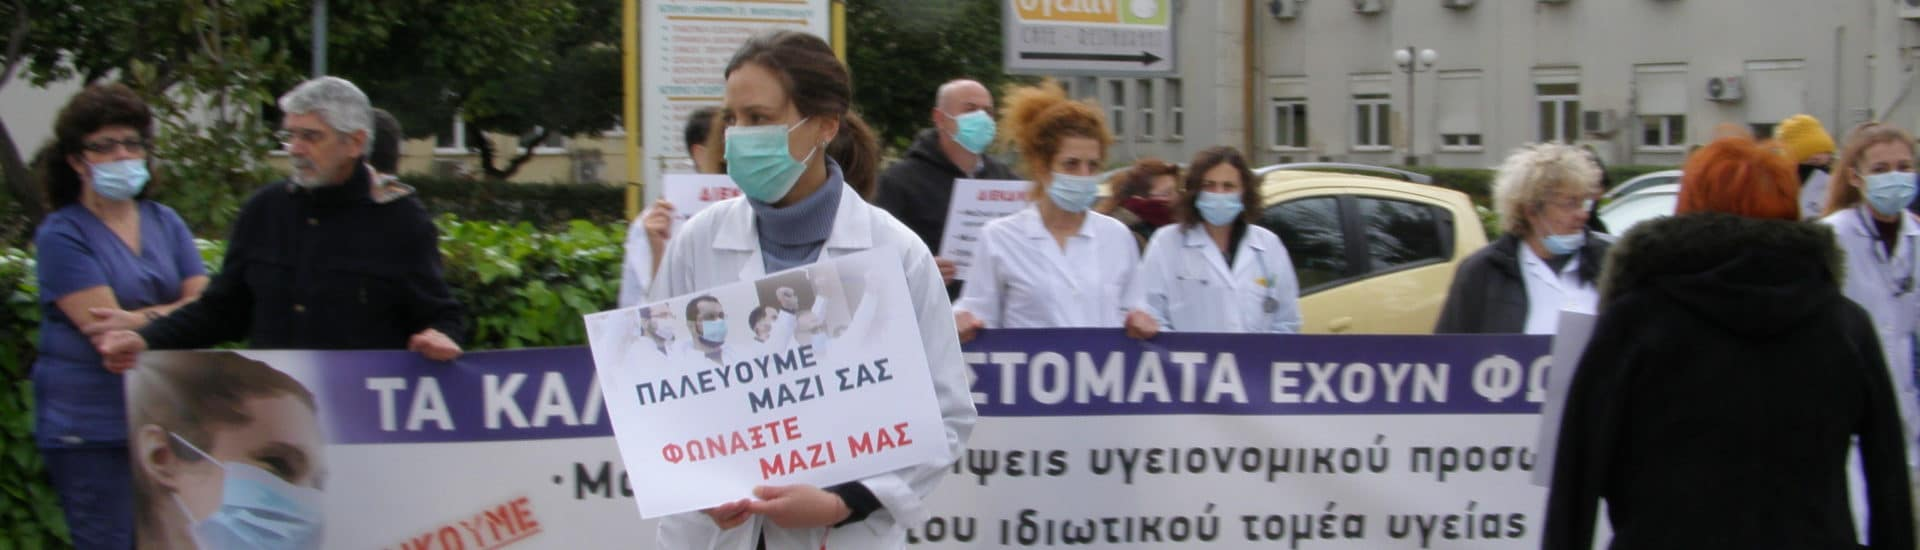 EEΚ: Νέα πανελλαδική κινητοποίηση στα νοσοκομεία!